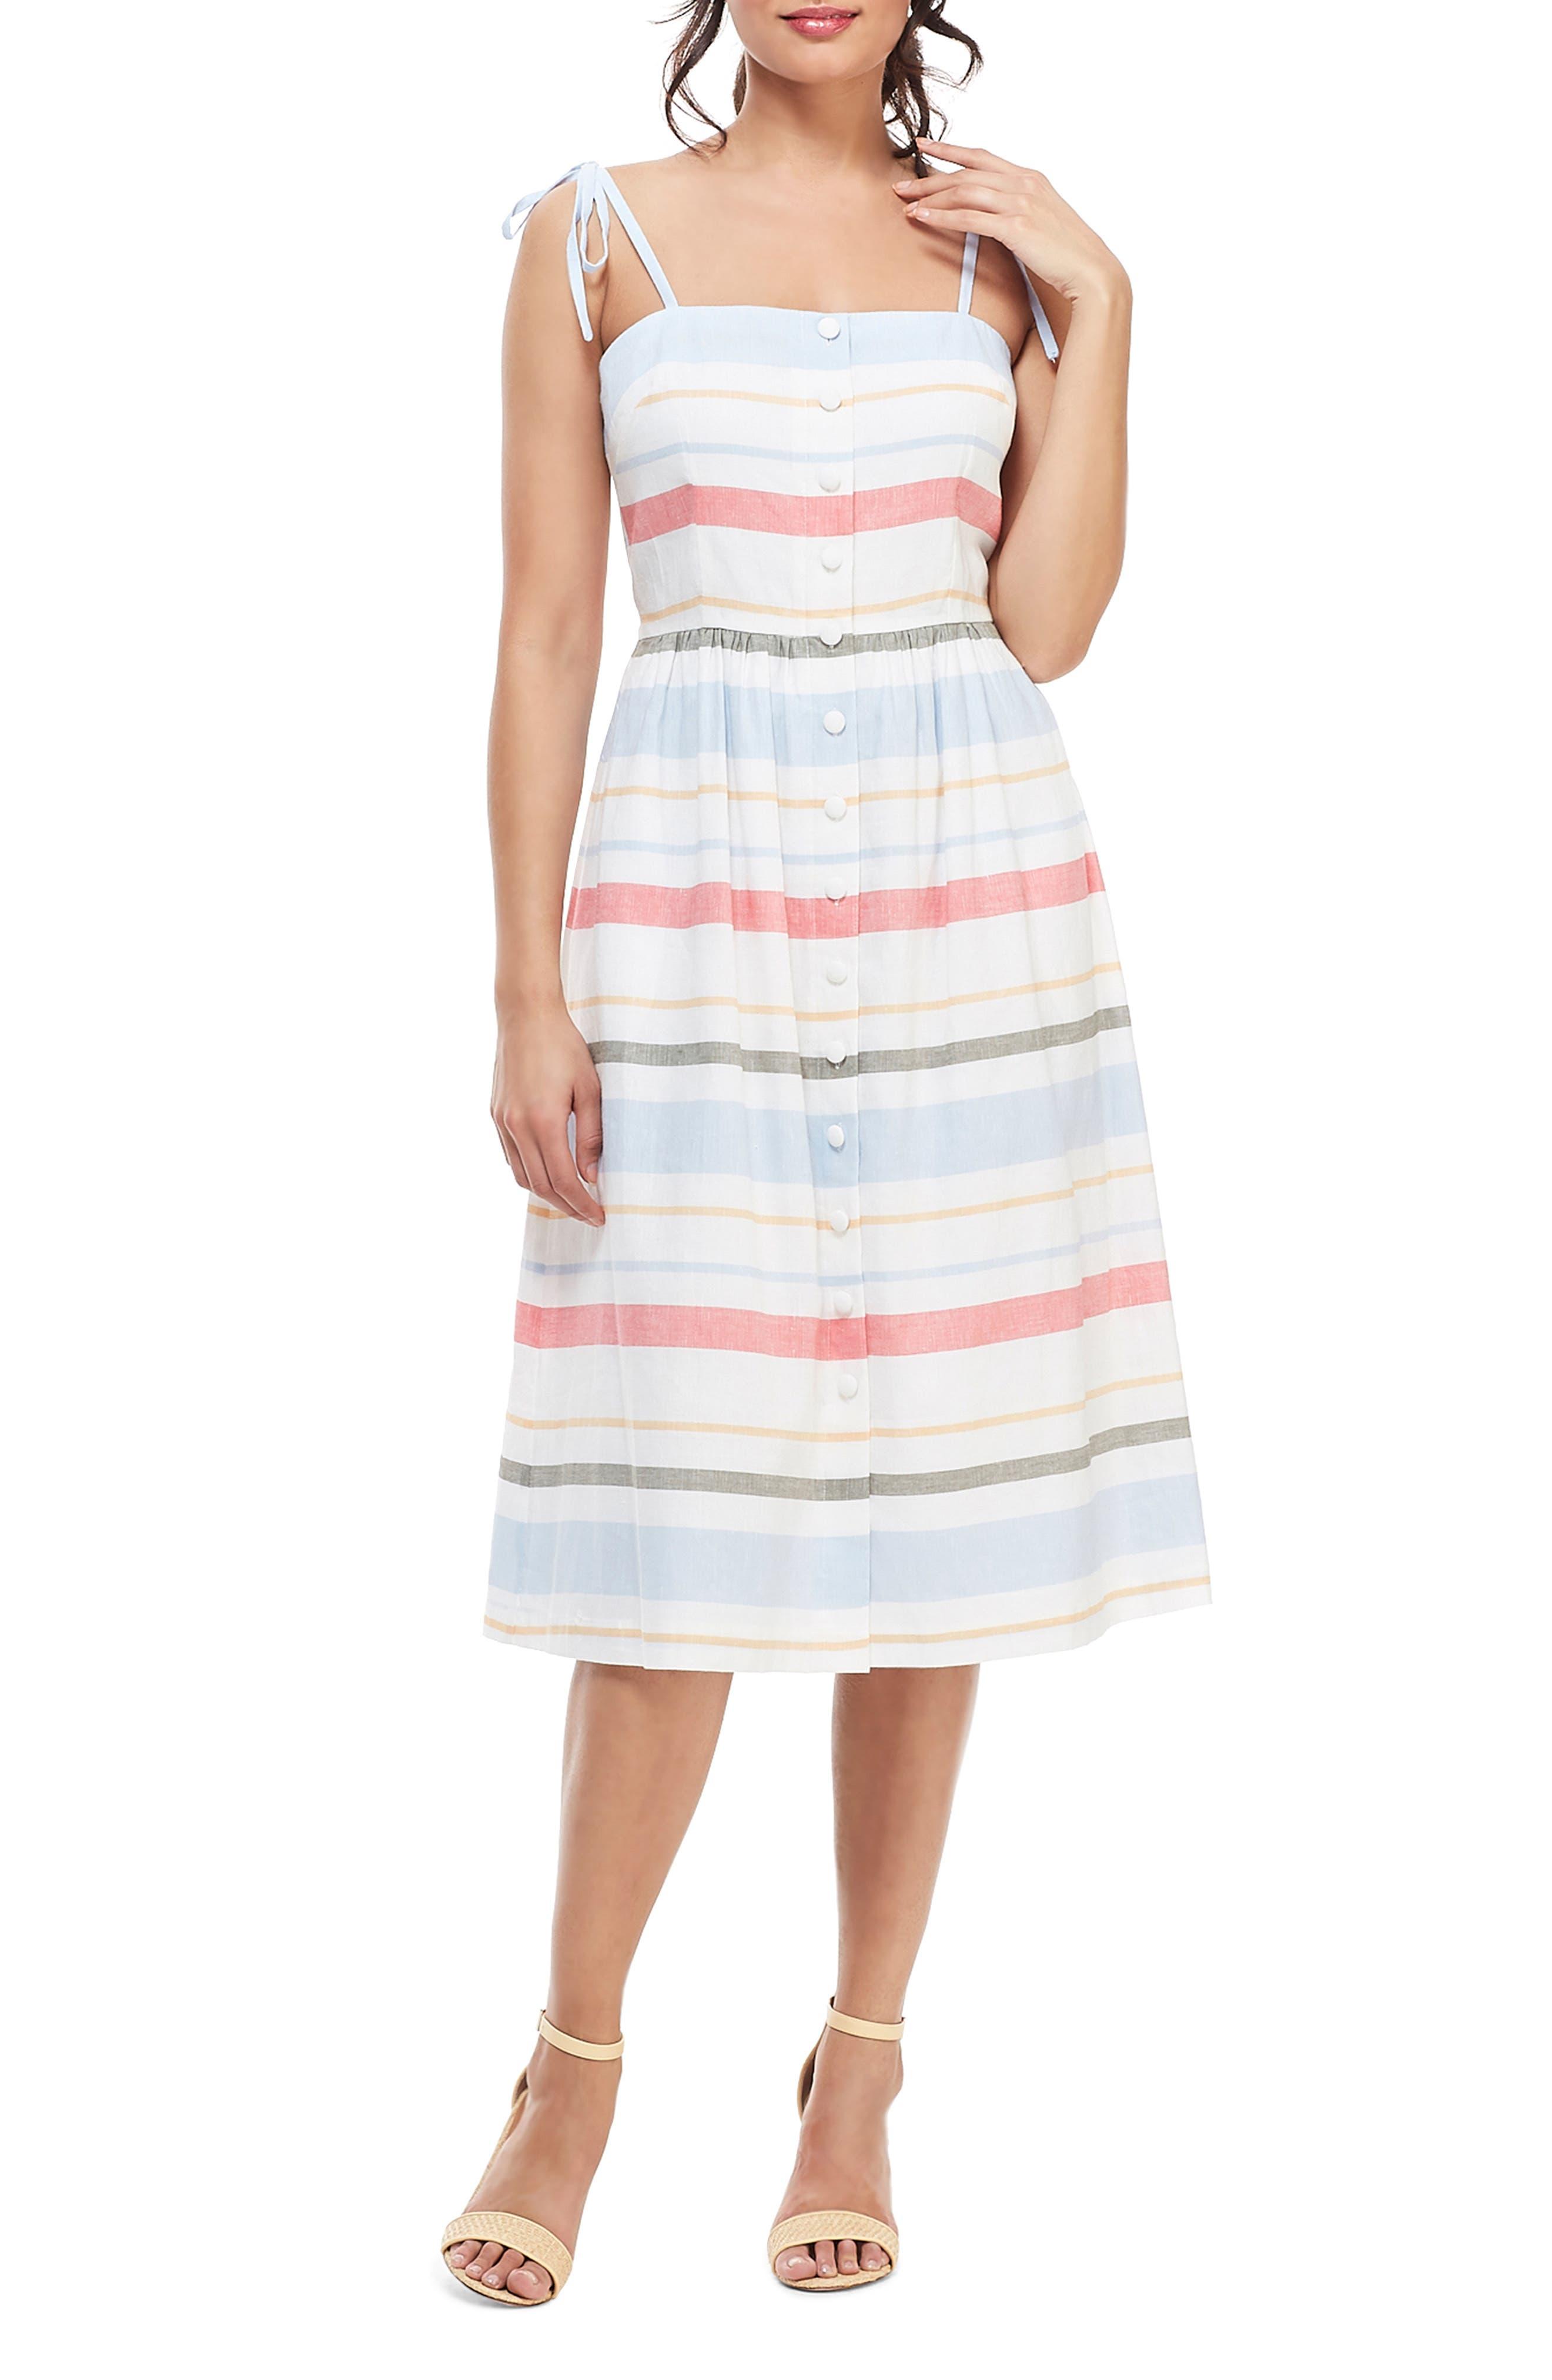 1960s Dresses | 60s Dresses Mod, Mini, Jackie O, Hippie Womens Gal Meets Glam Collection Hattie Stripe Linen Blend Sundress $178.00 AT vintagedancer.com